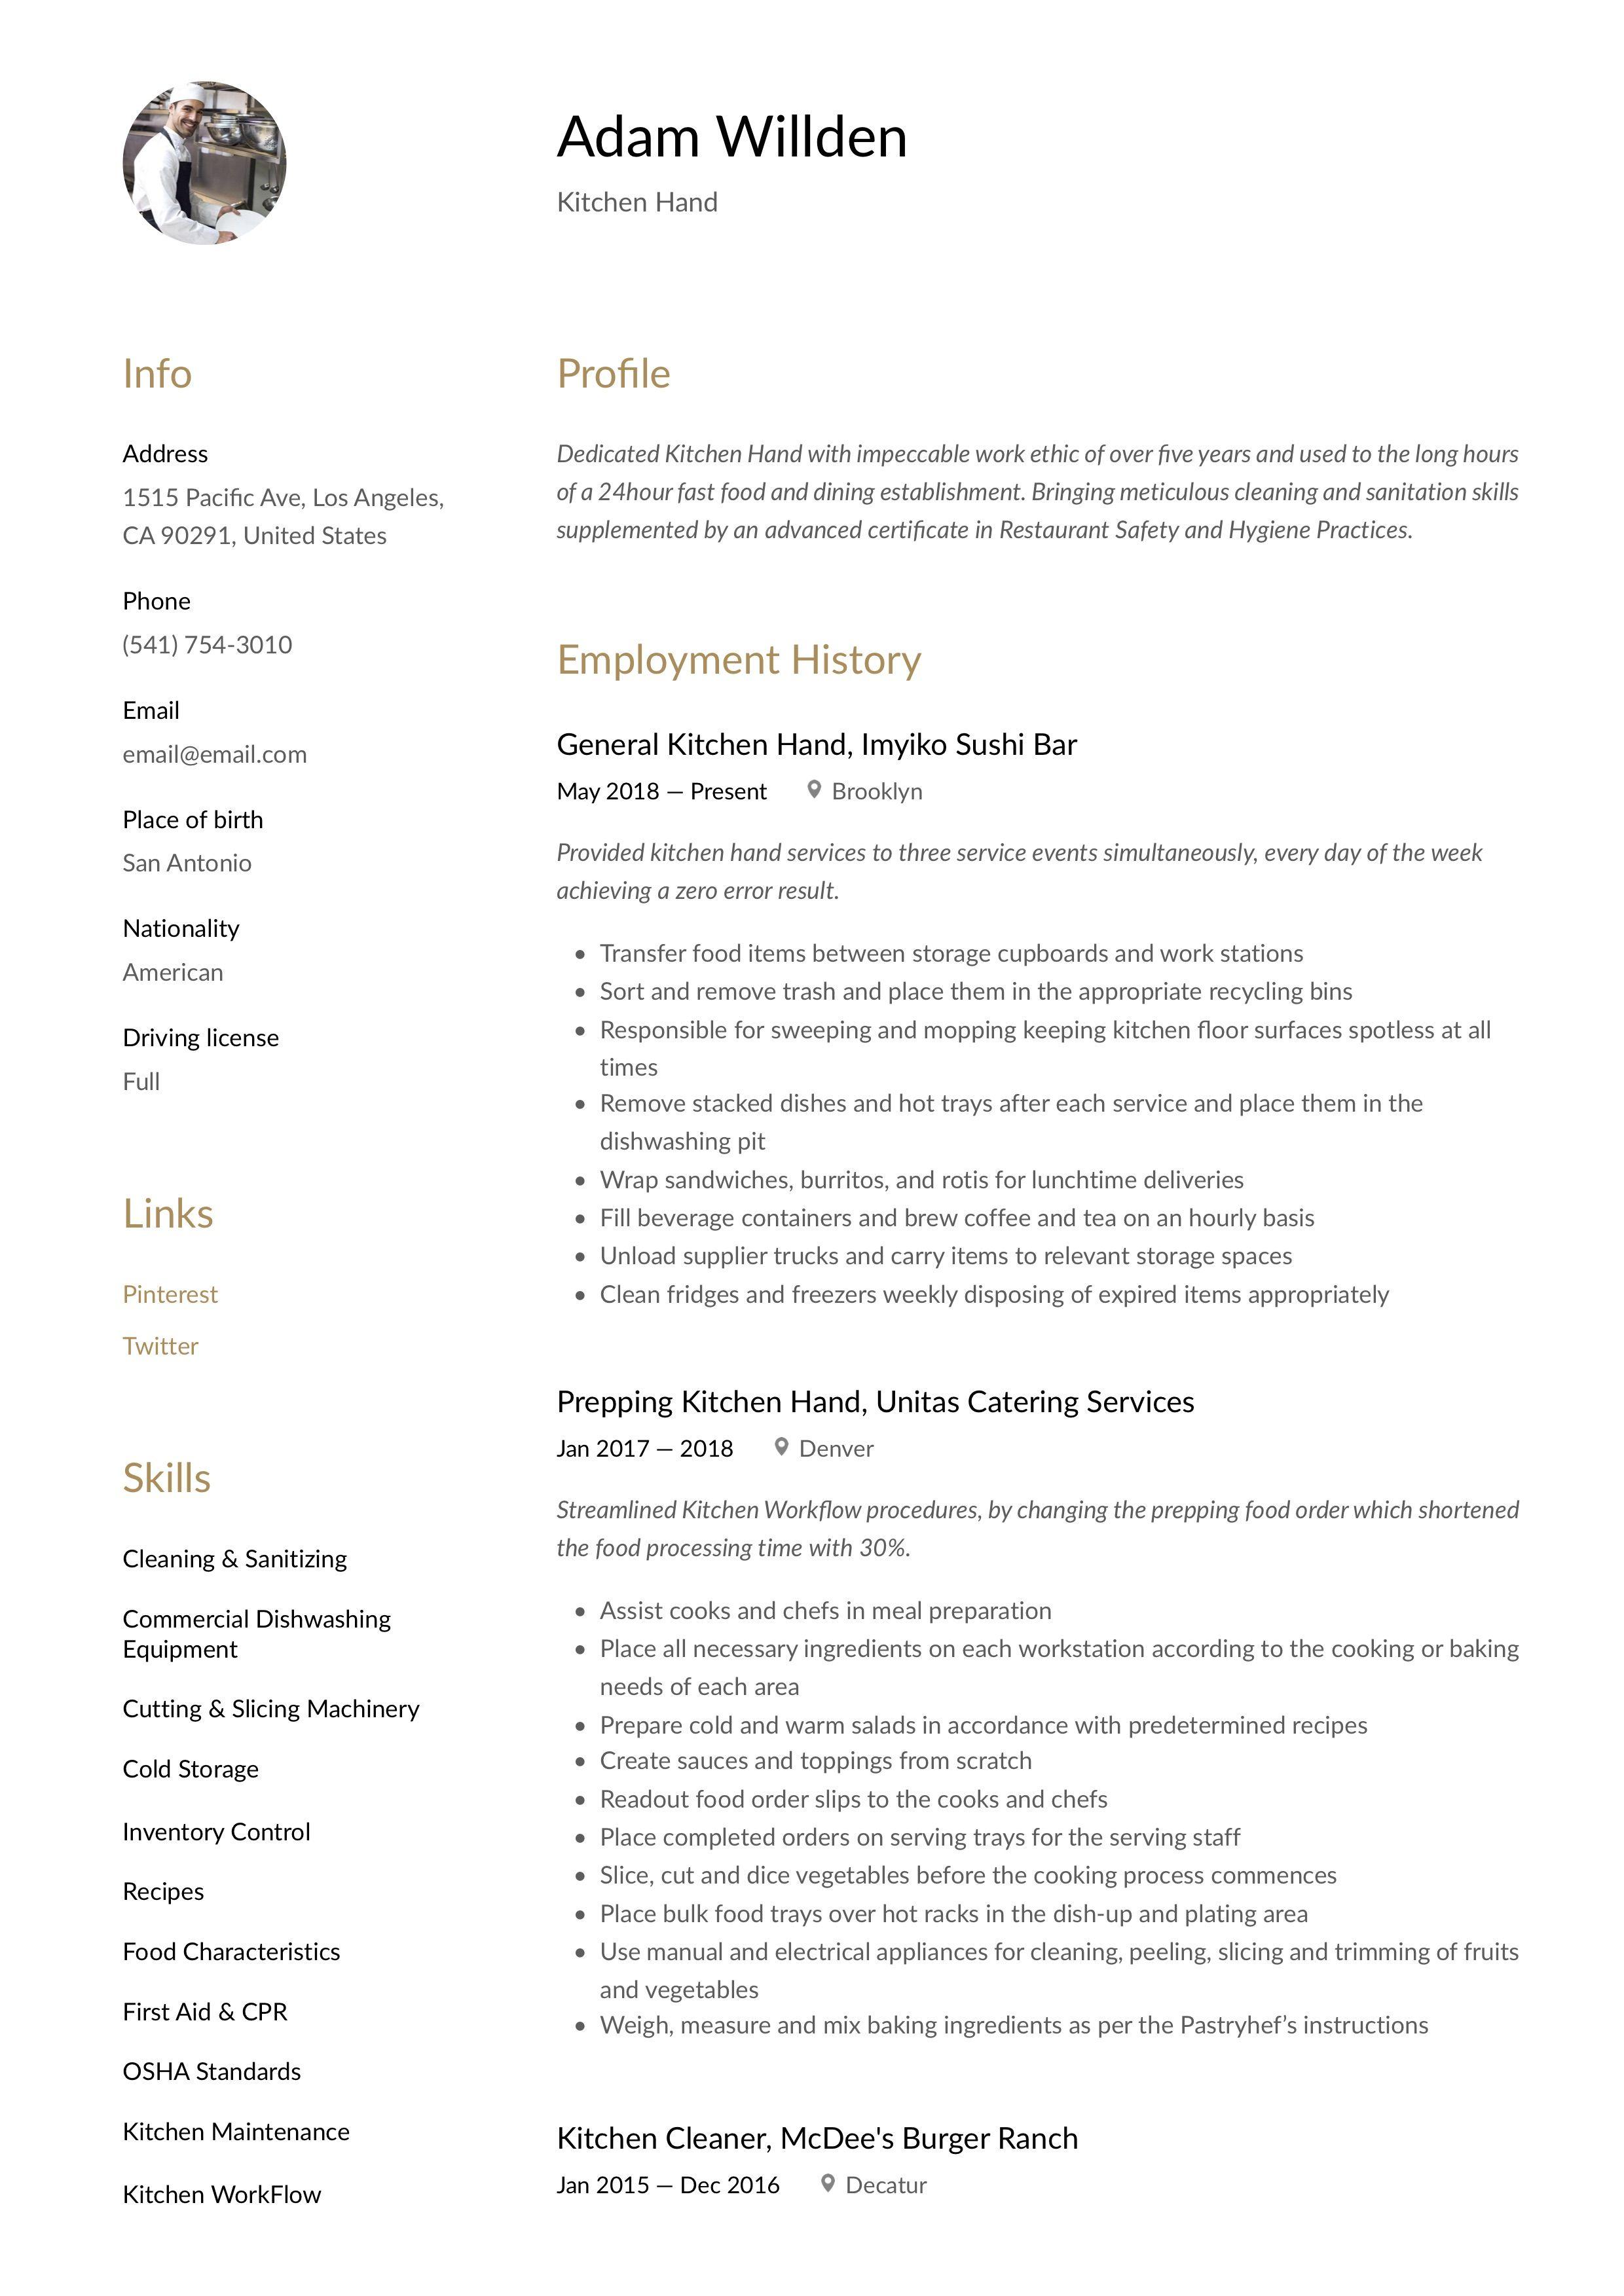 Modern Kitchen Hand Resume, template, design, tips